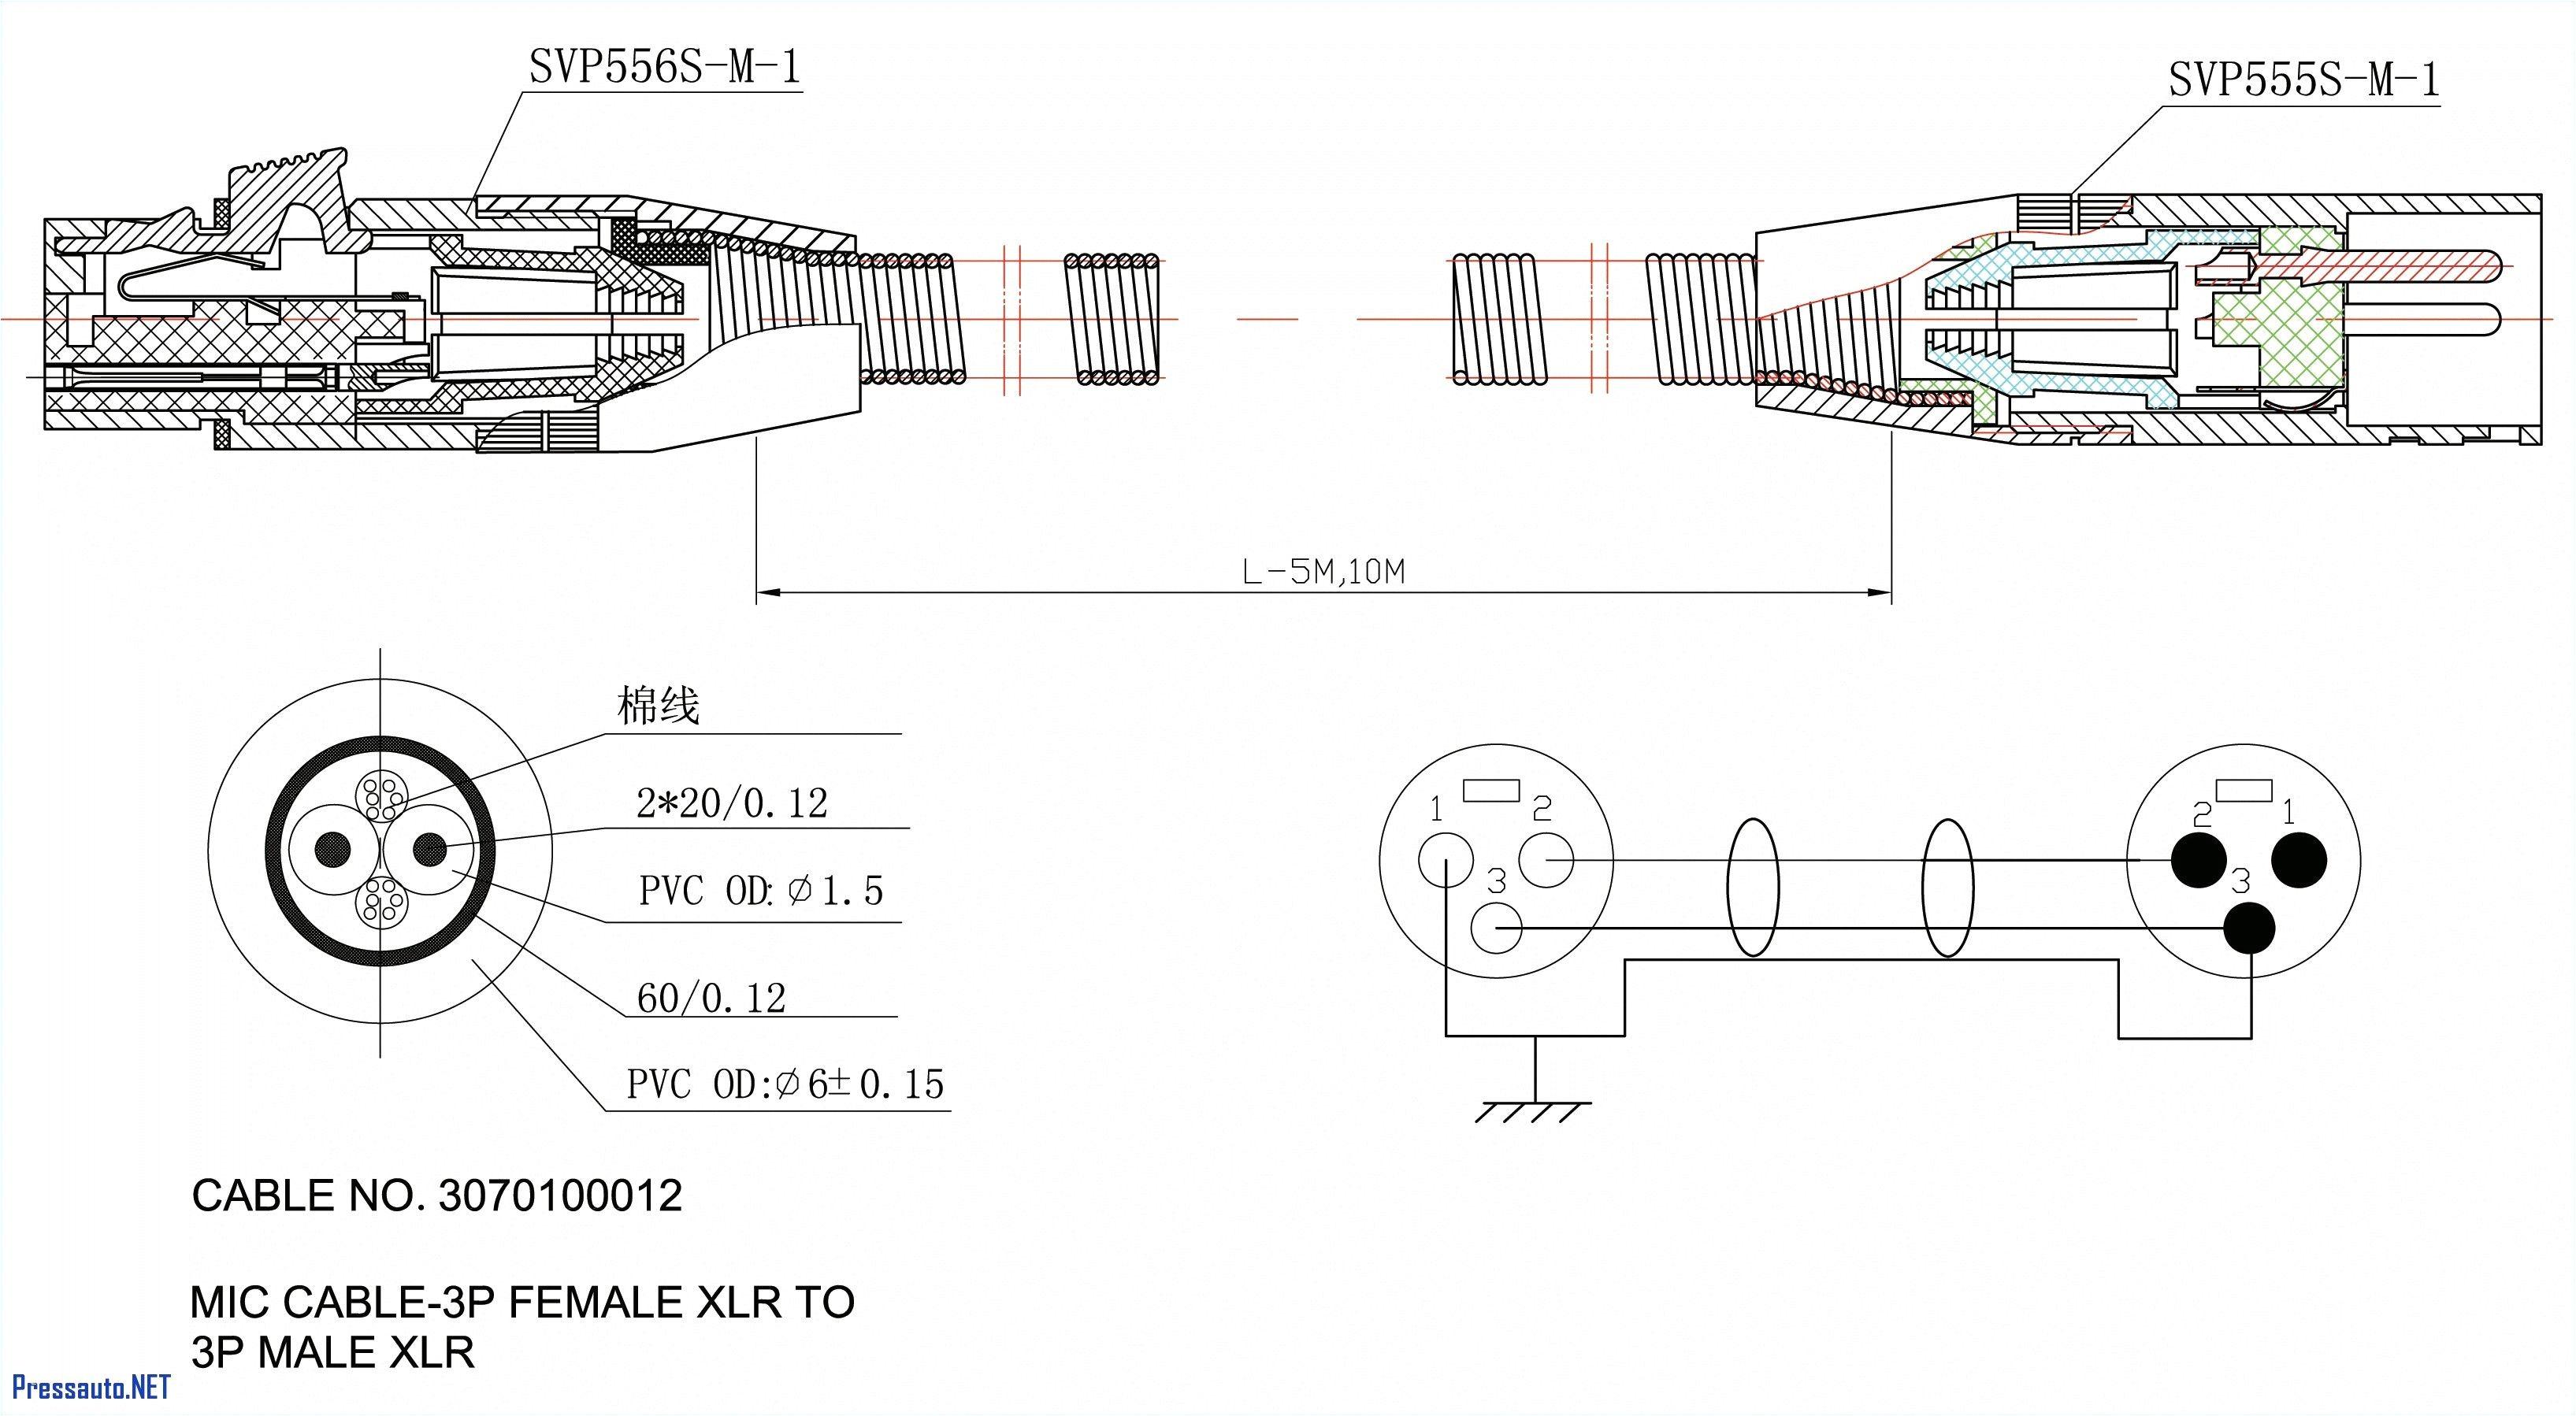 orthman wiring diagram wiring diagrams konsult wiring indicator diagram light r9 86l